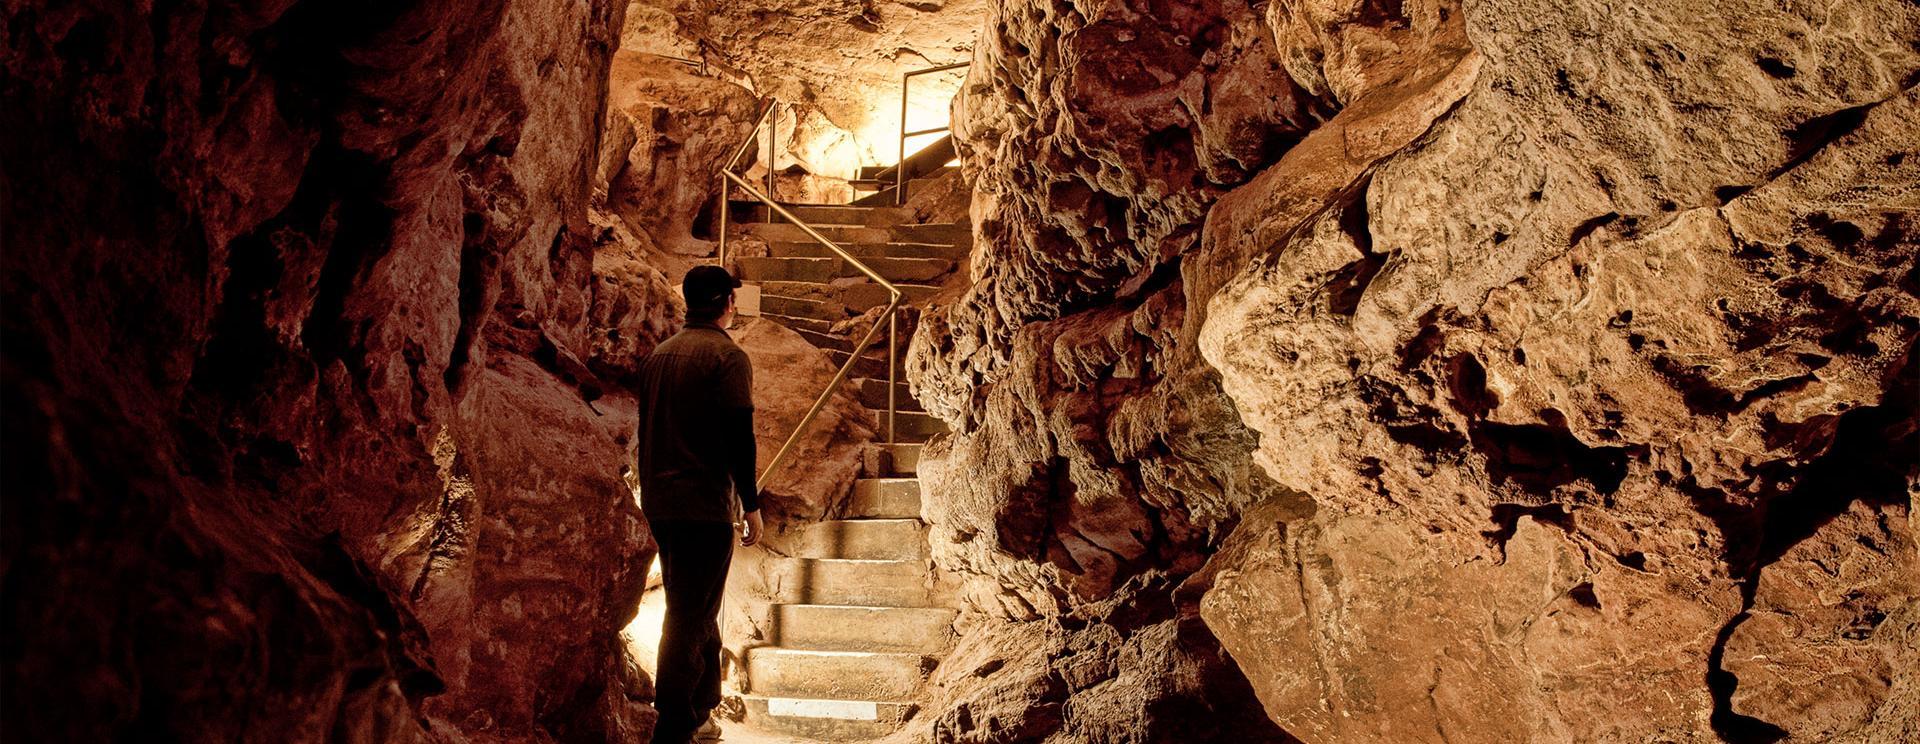 Rushmore Cave